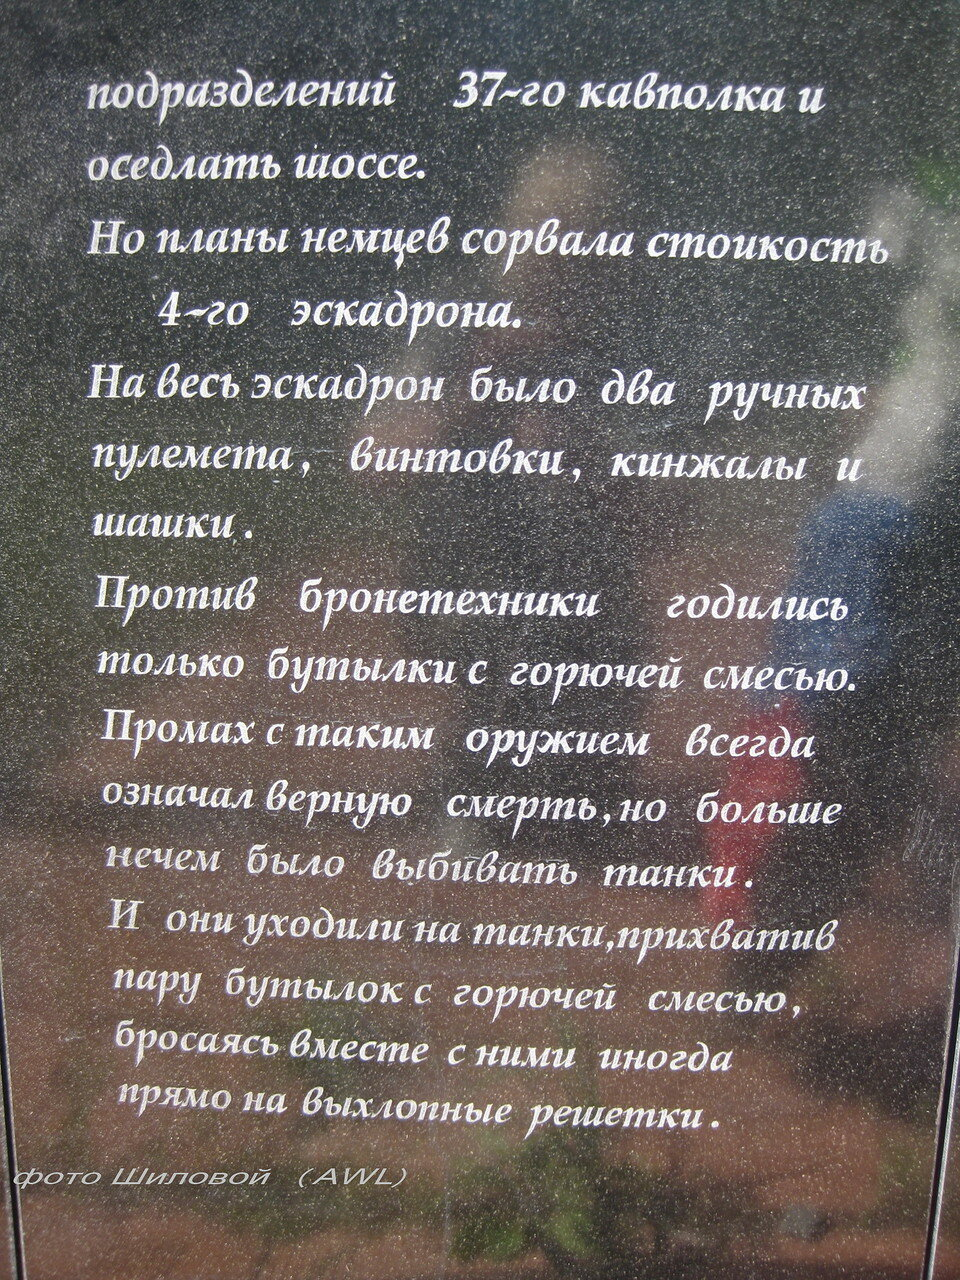 https://img-fotki.yandex.ru/get/113961/199368979.1c/0_1bdf48_5df64b3f_XXXL.jpg